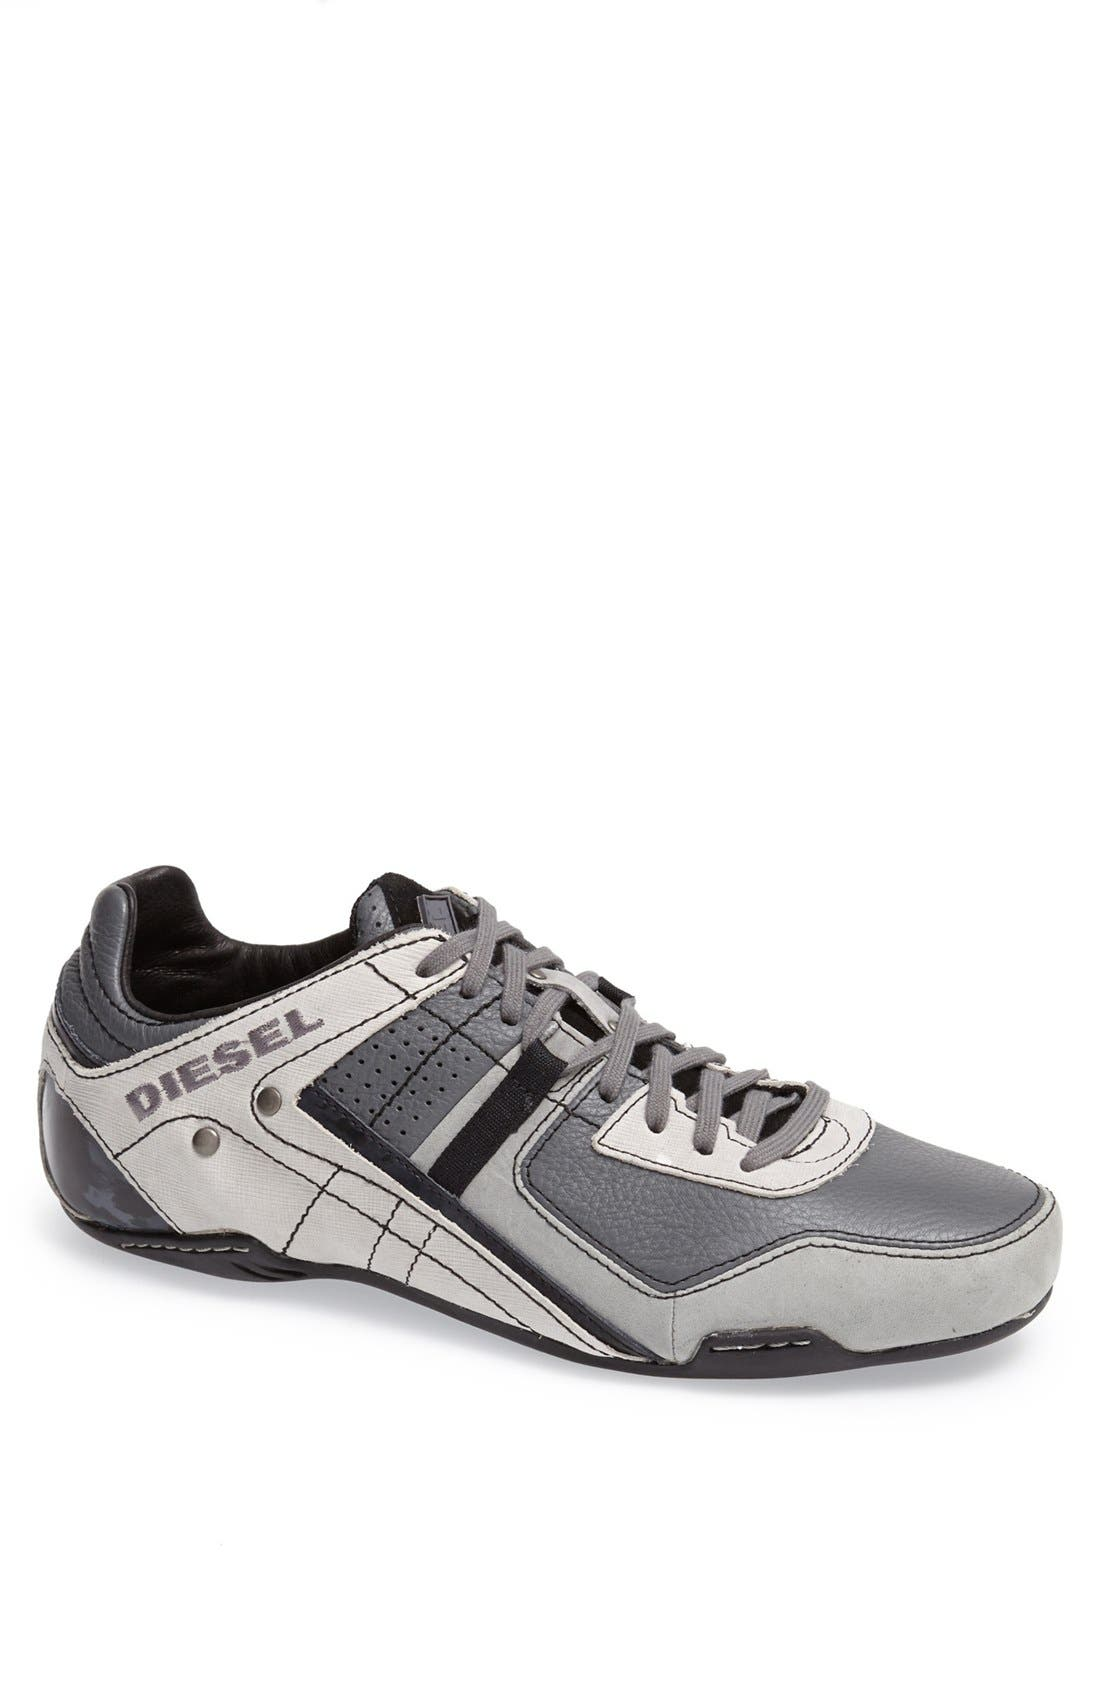 Main Image - DIESEL® 'Trackkers Korbin II' Sneaker (Men)